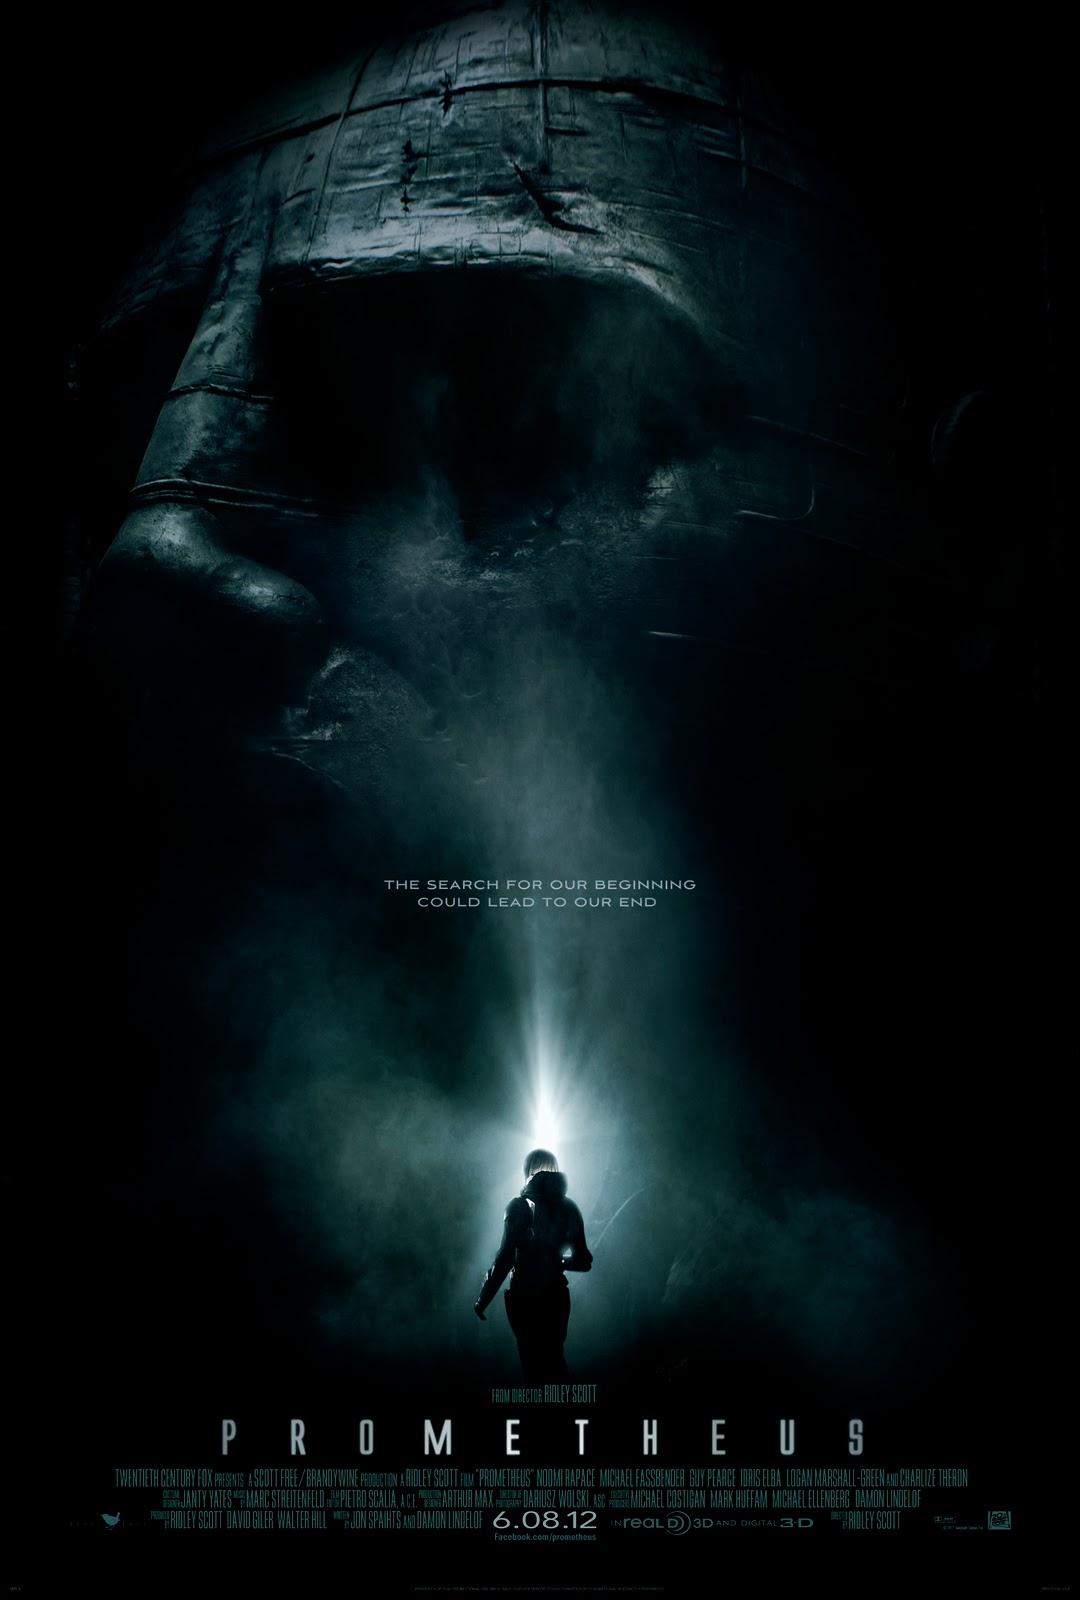 http://2.bp.blogspot.com/-w5UoIaidNA4/Tukcm8JFm2I/AAAAAAAAAsA/siZFMhbl5MQ/s1600/promethesus-movie-poster-teaser-01.jpg